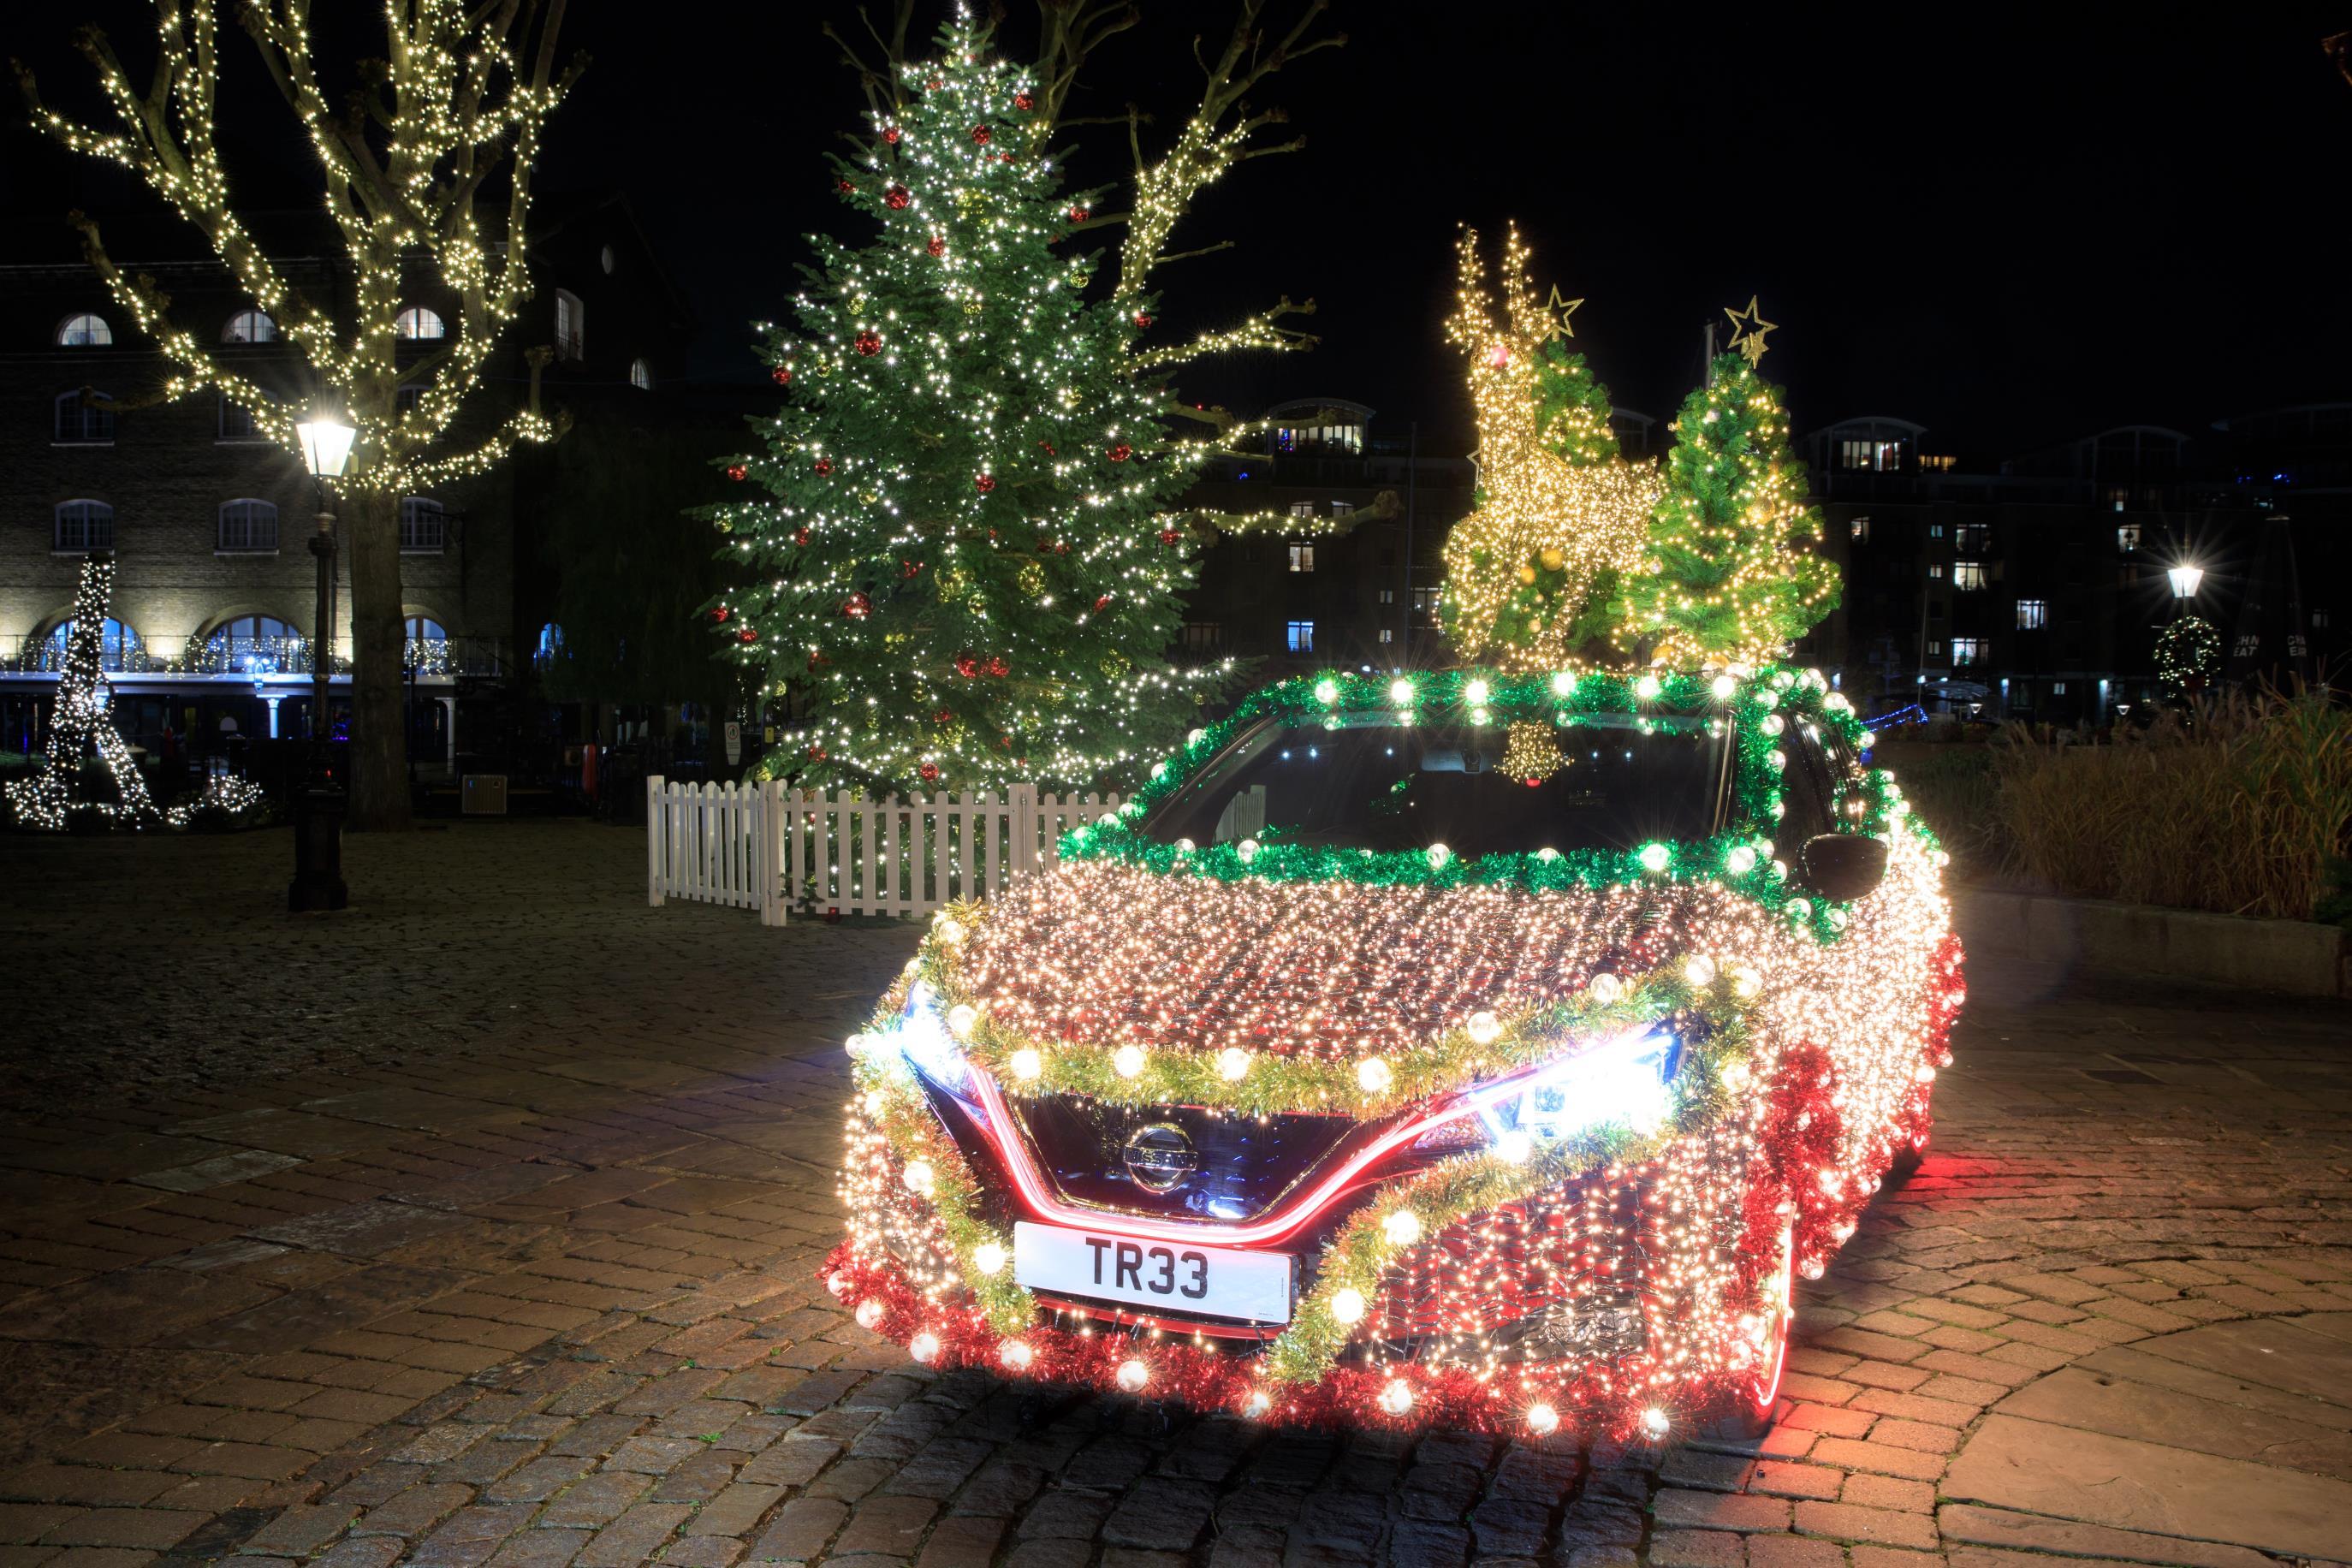 The festive Leaf features hundreds of LED lights